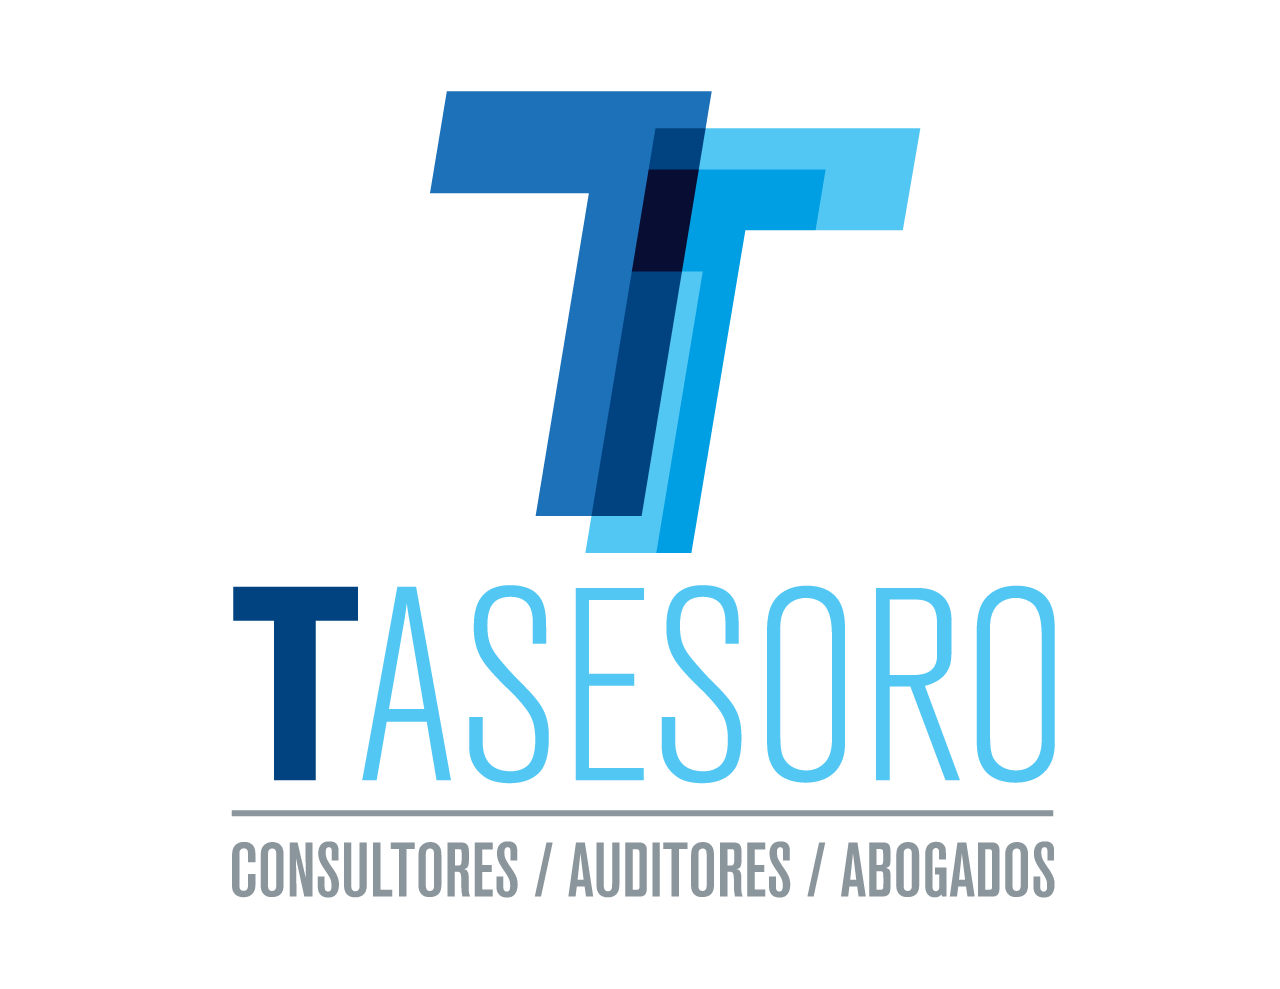 TASESORO